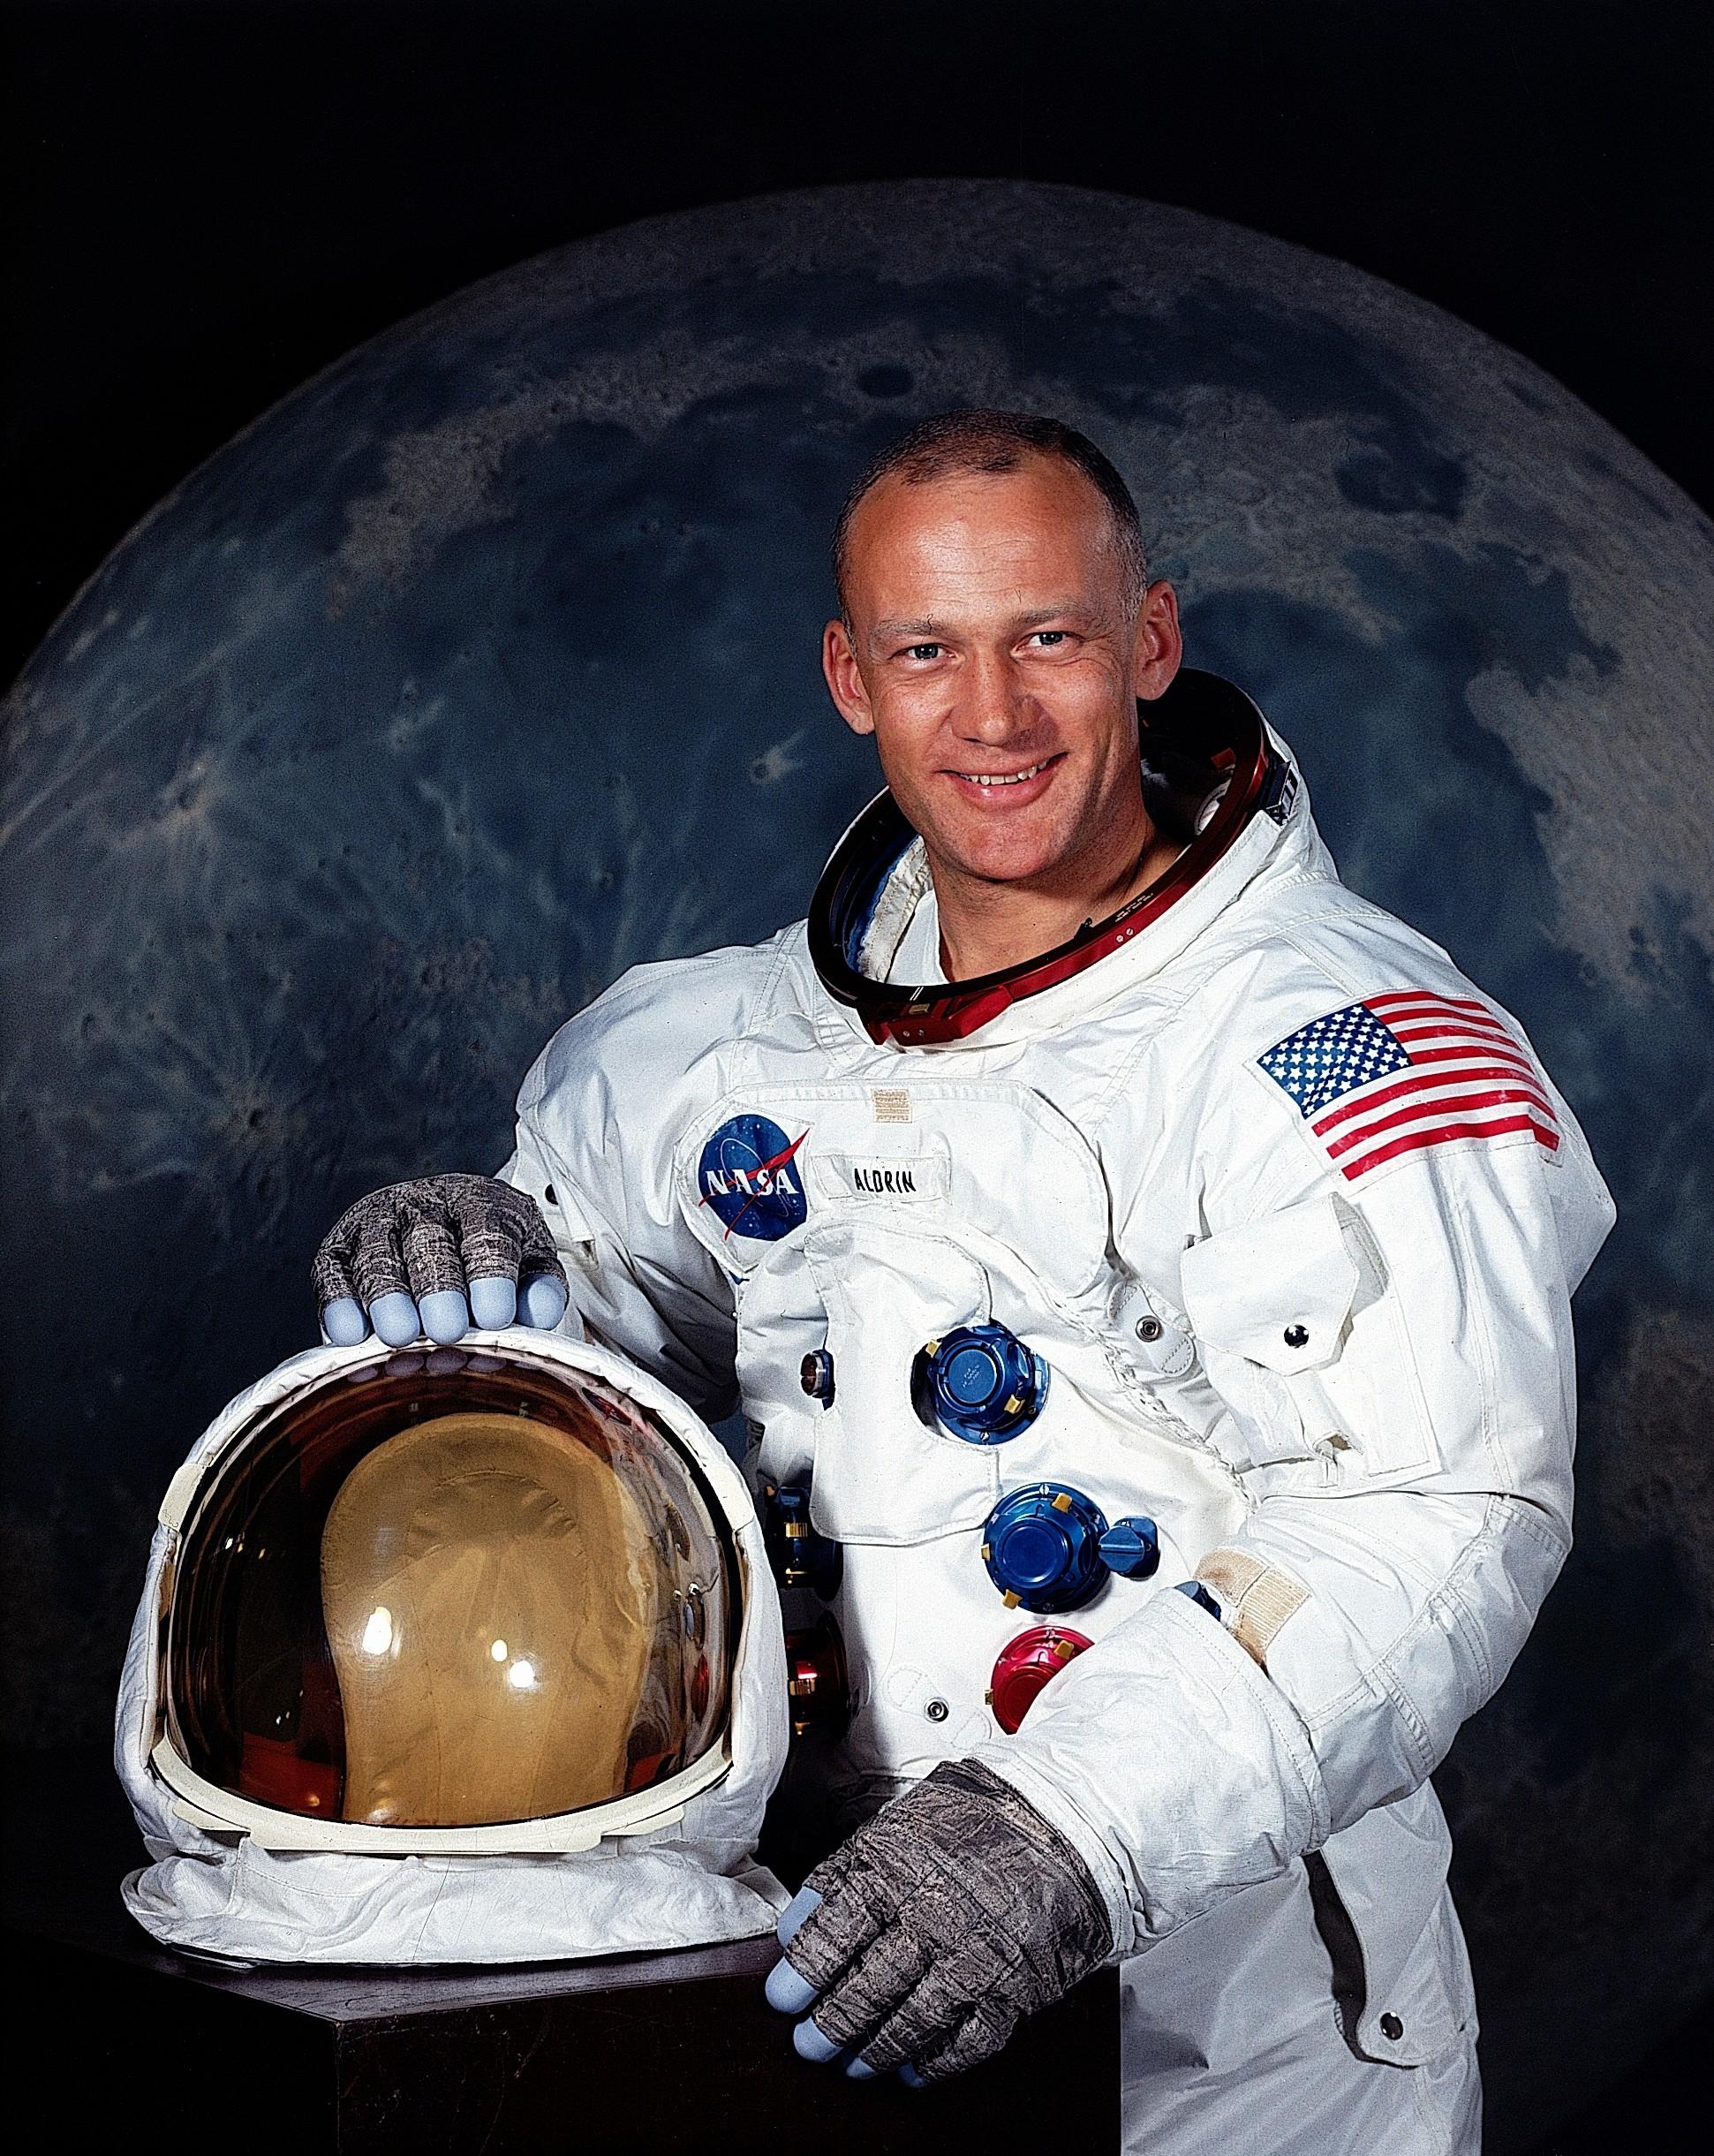 Buzz Aldrin fez parte da missão Apollo 11 (Foto: NASA)